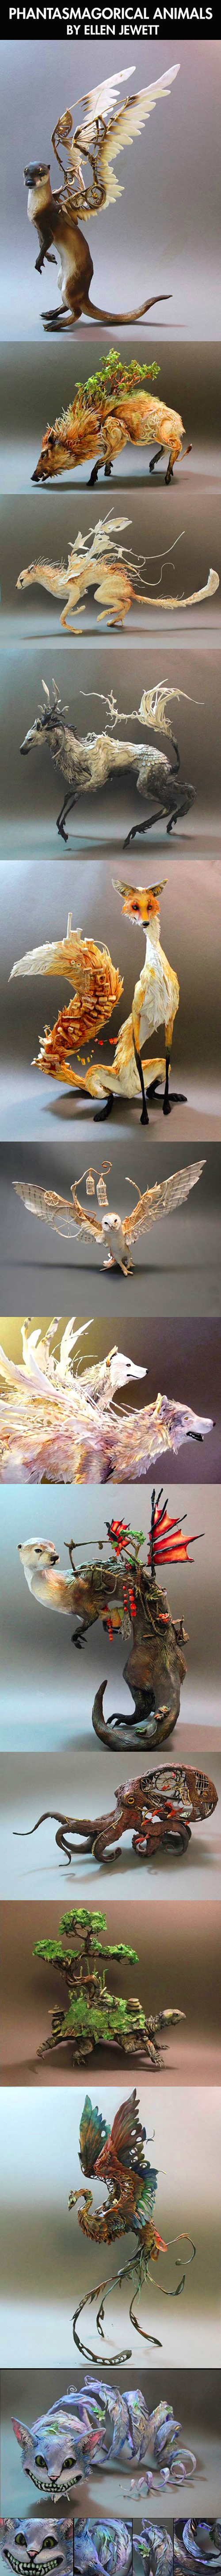 Amazing animal sculpture art.